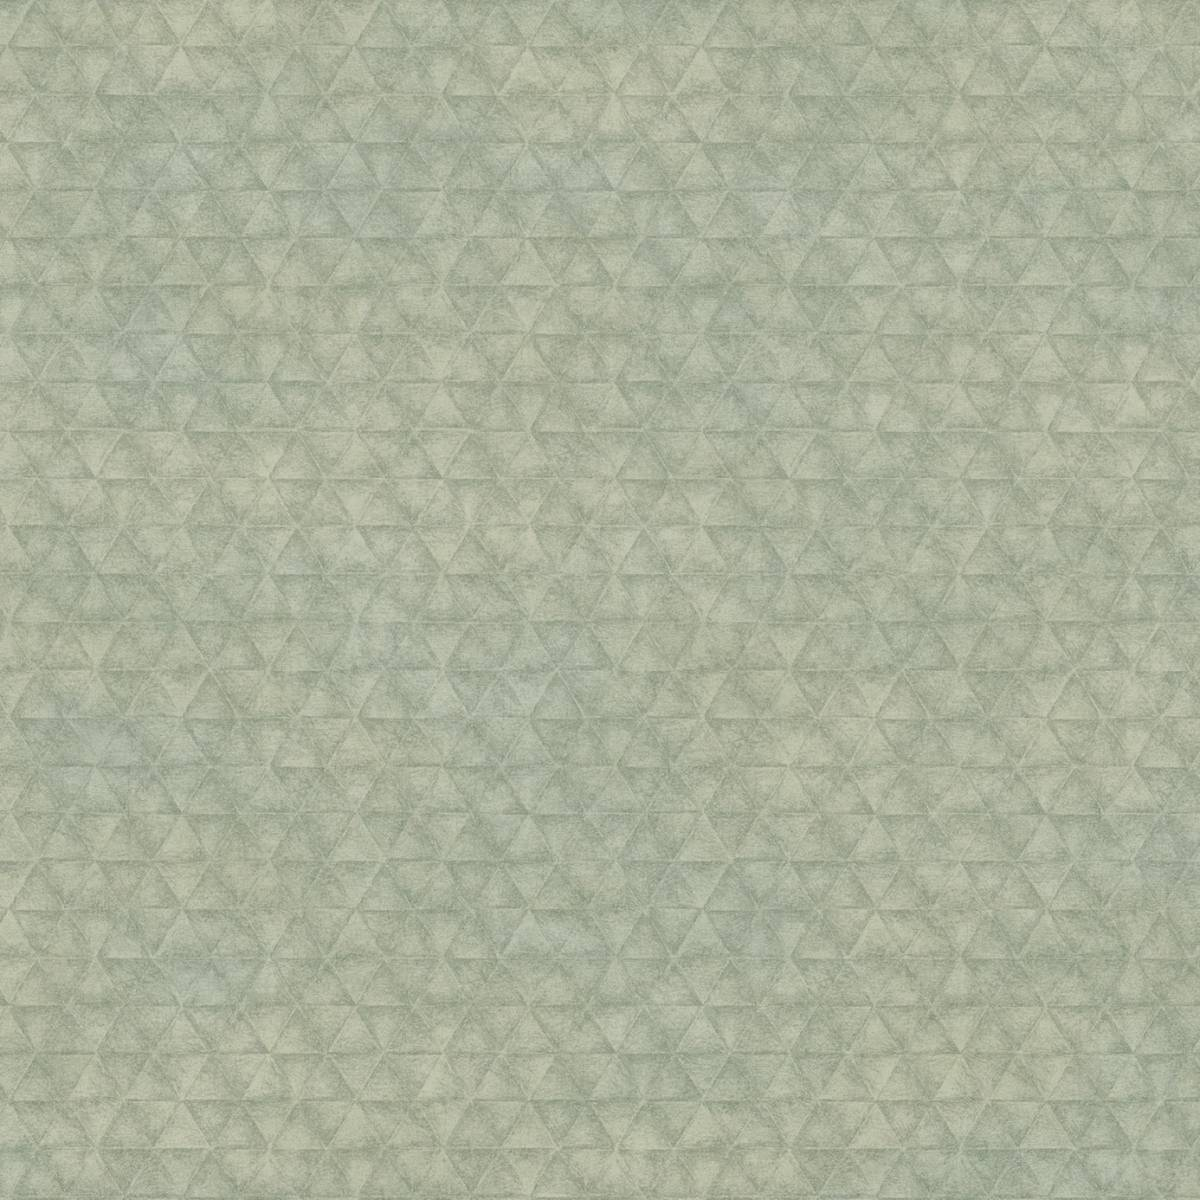 Casamance Shadows Wallpapers Irony Wallpaper - Vert De Gris - 73550348. Loading zoom